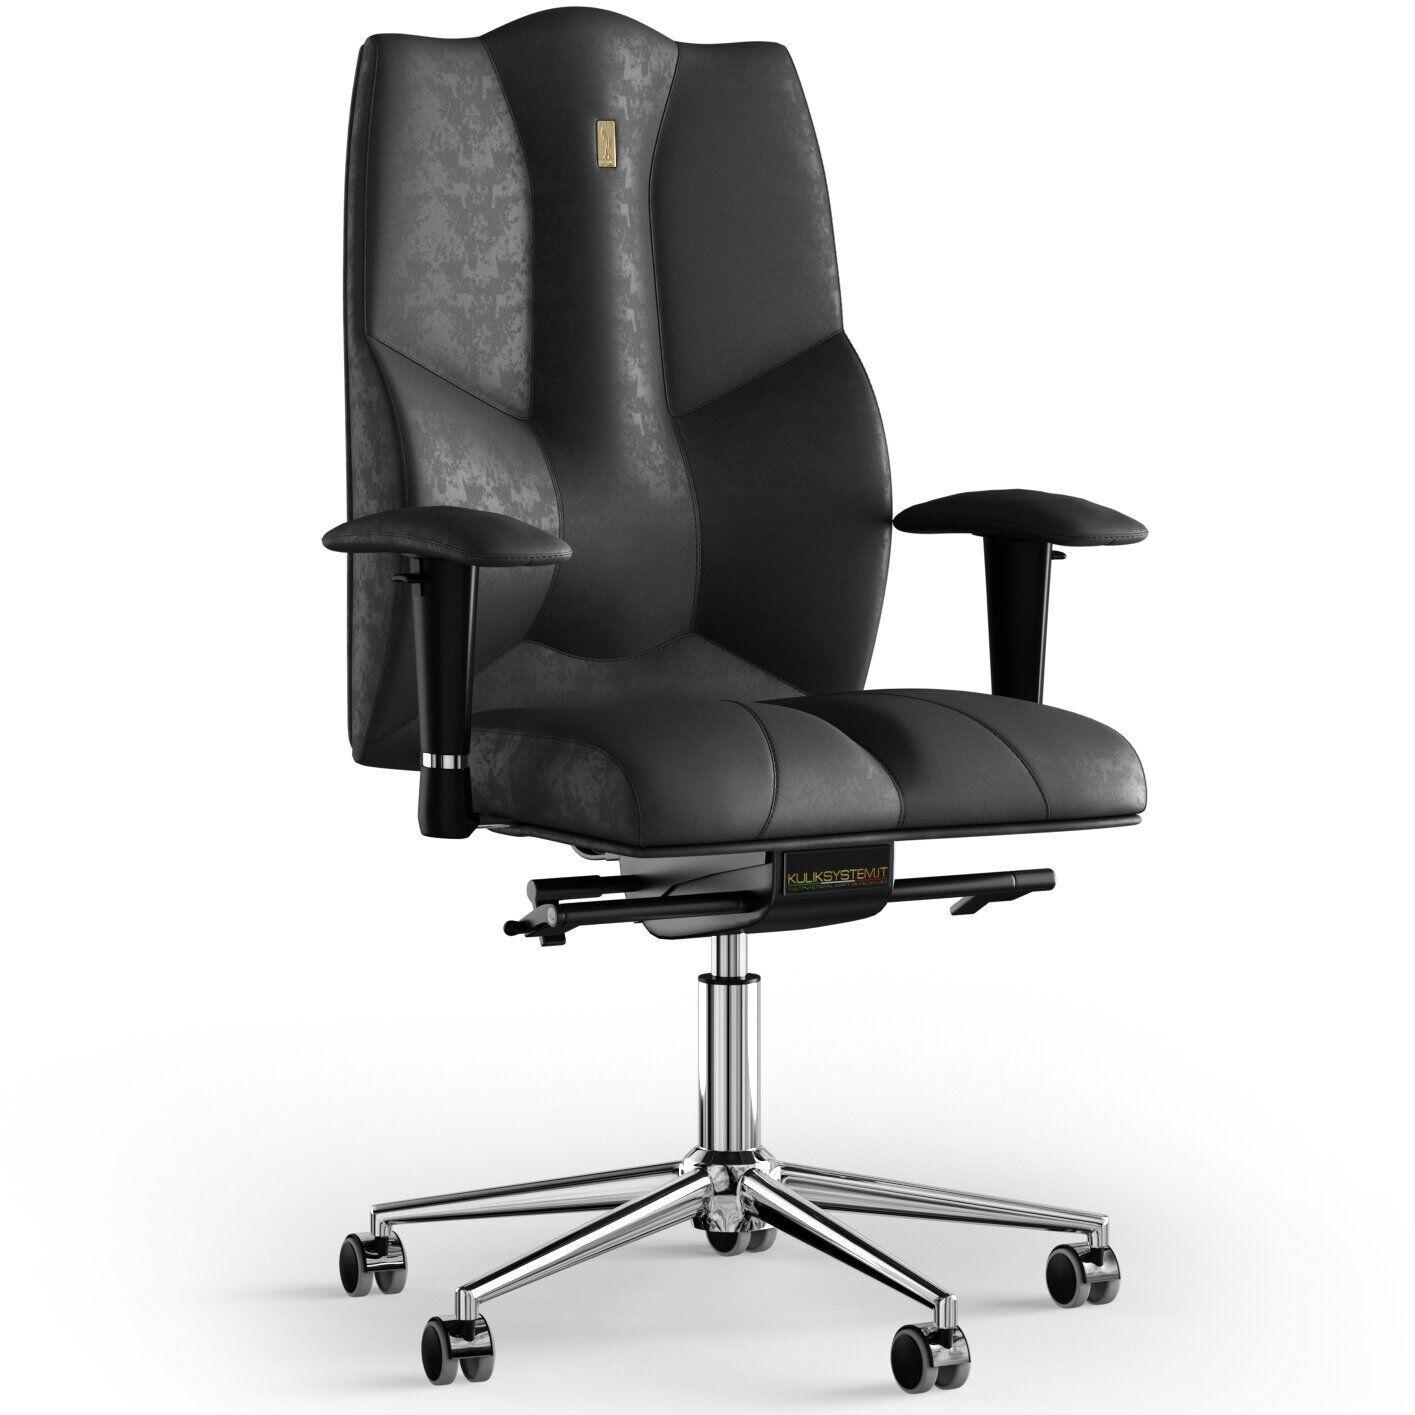 Кресло KULIK SYSTEM BUSINESS Антара без подголовника без строчки